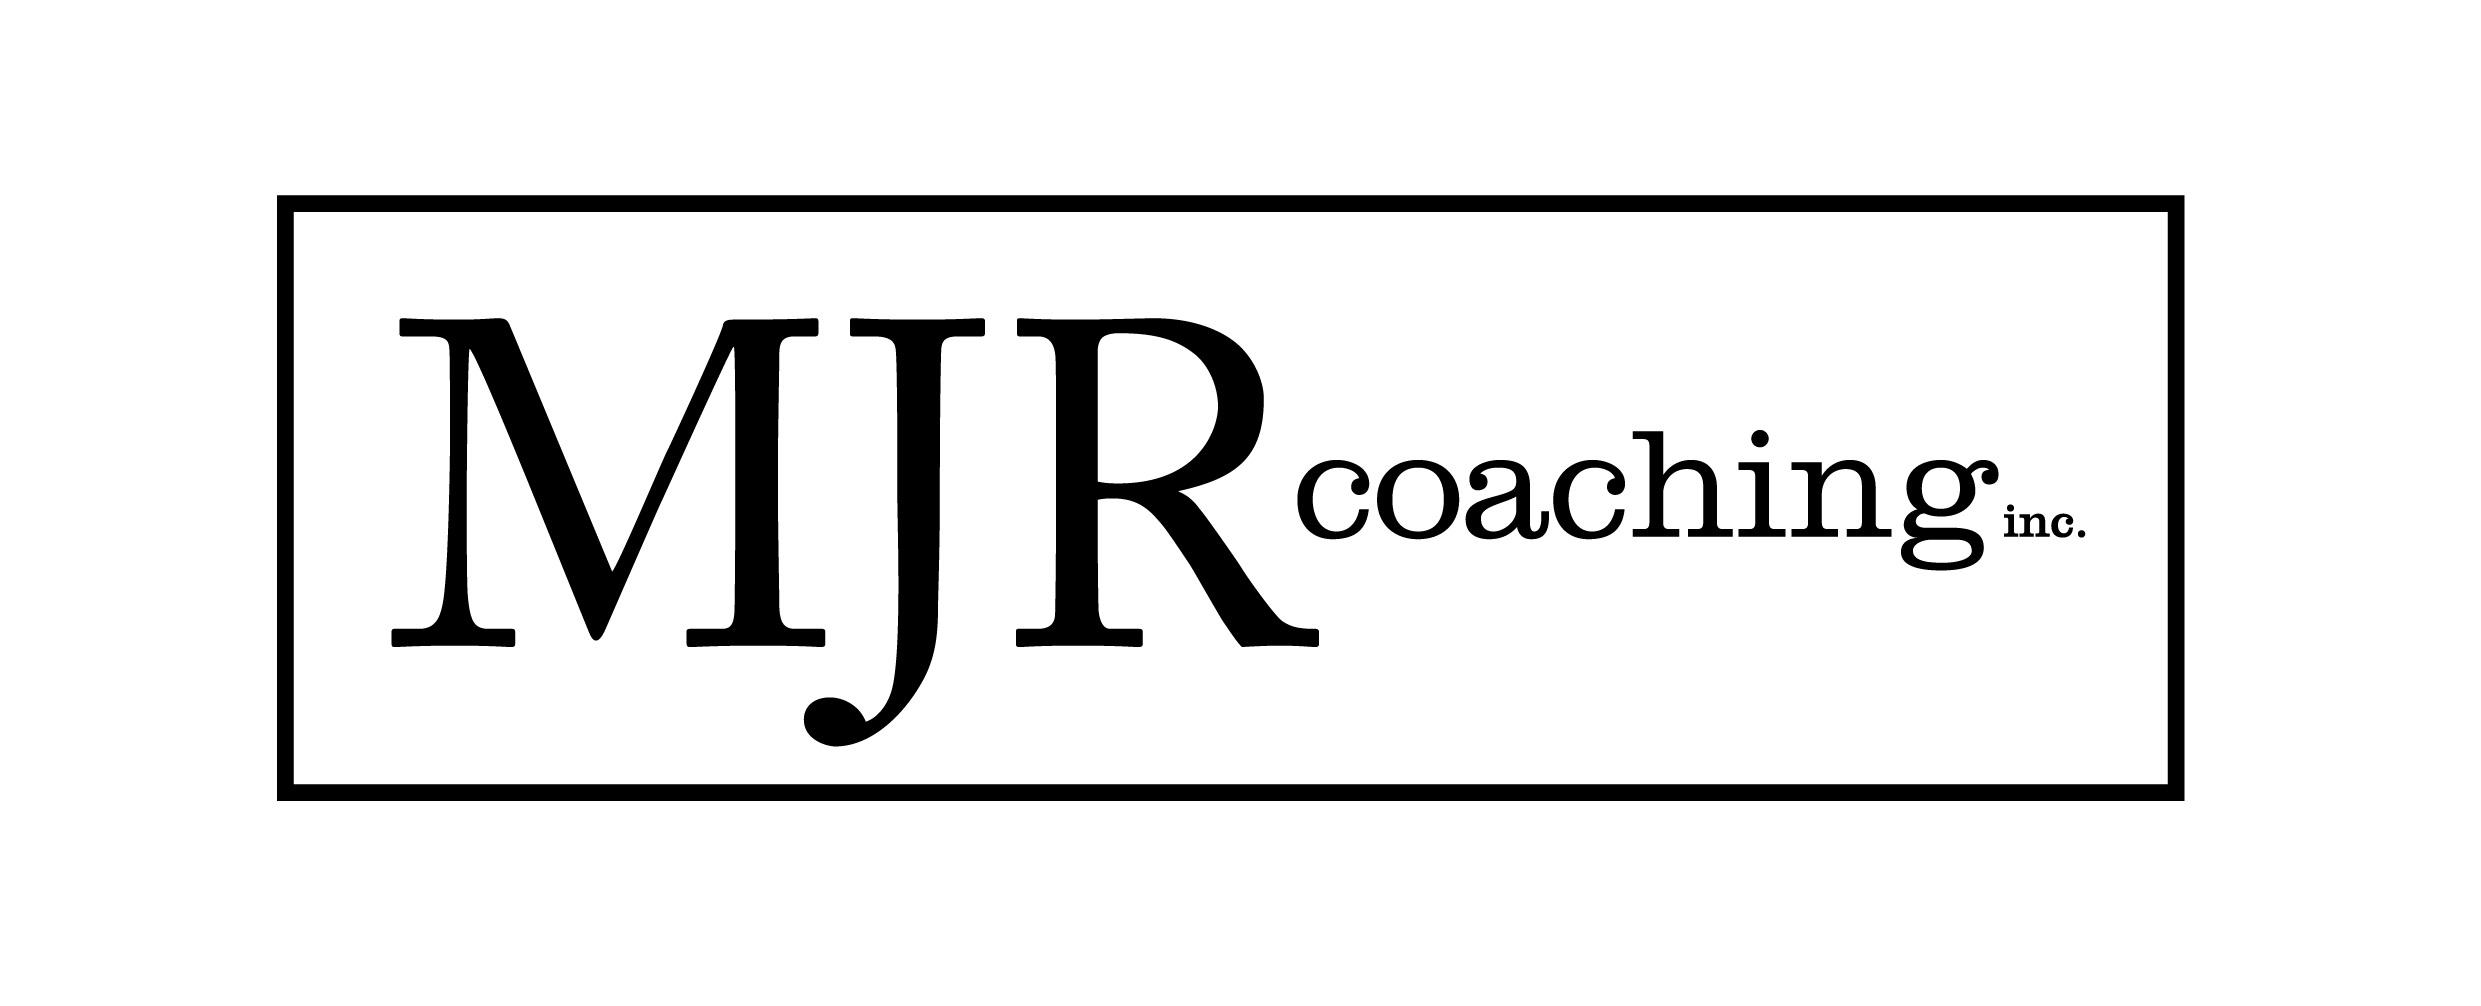 MJR Coaching Inc.